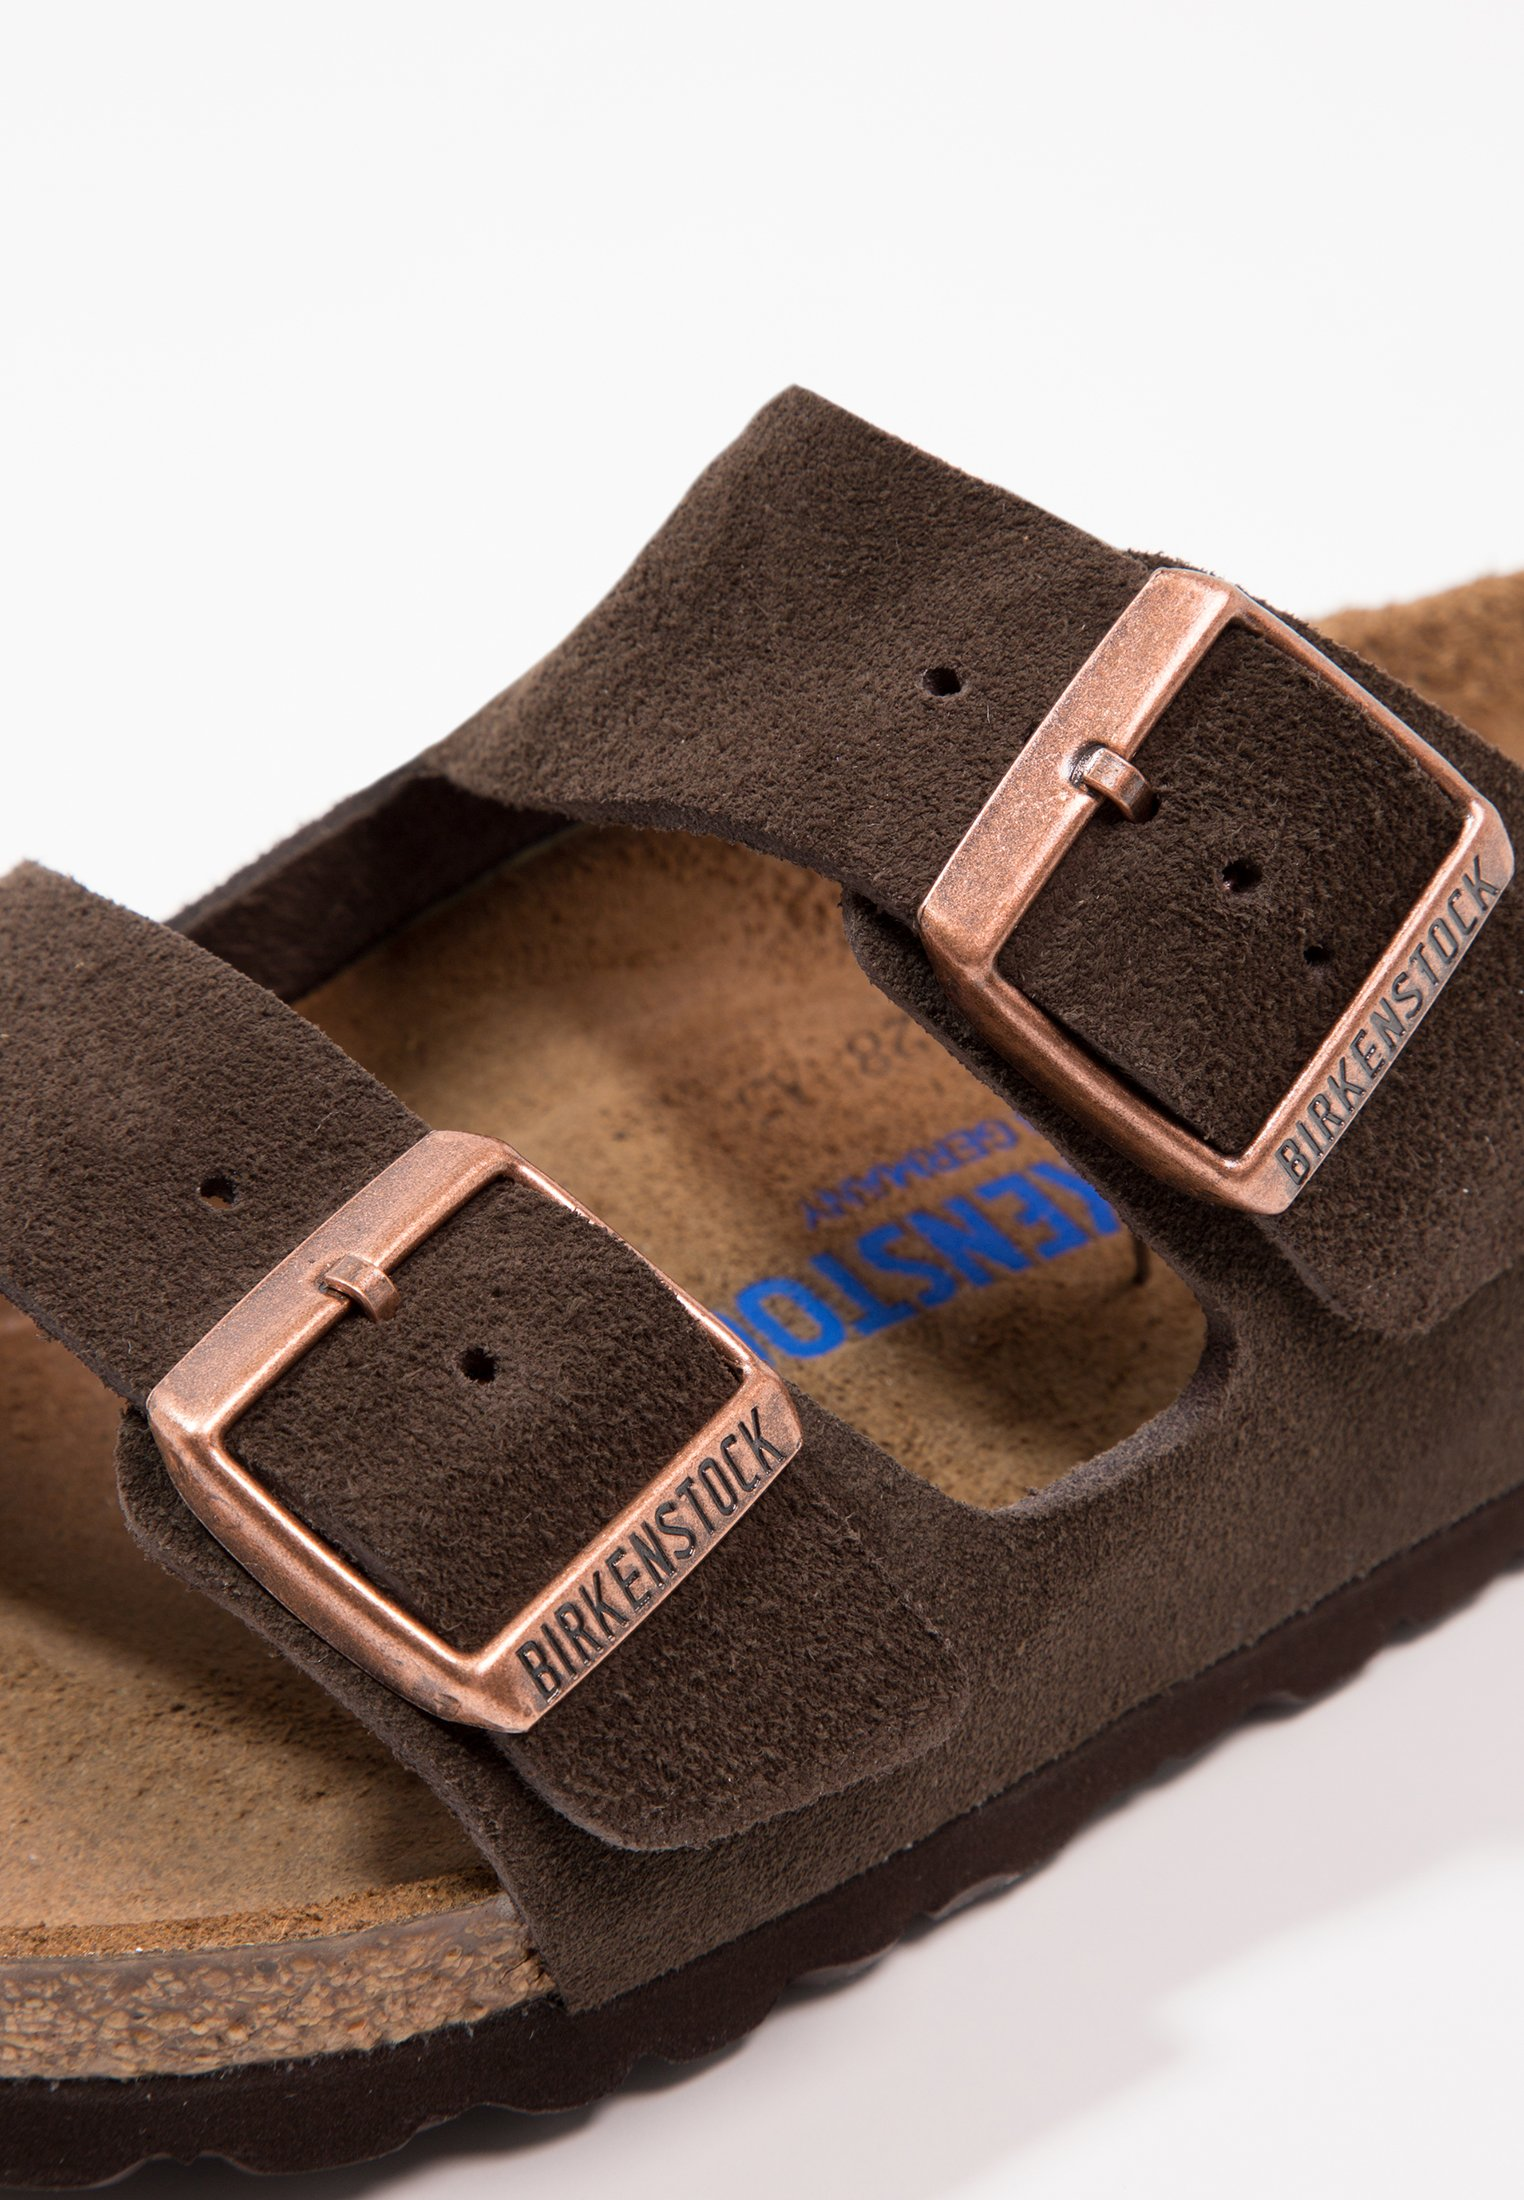 Birkenstock Arizona Soft Footbed - Ciabattine Mocca 7HkRb